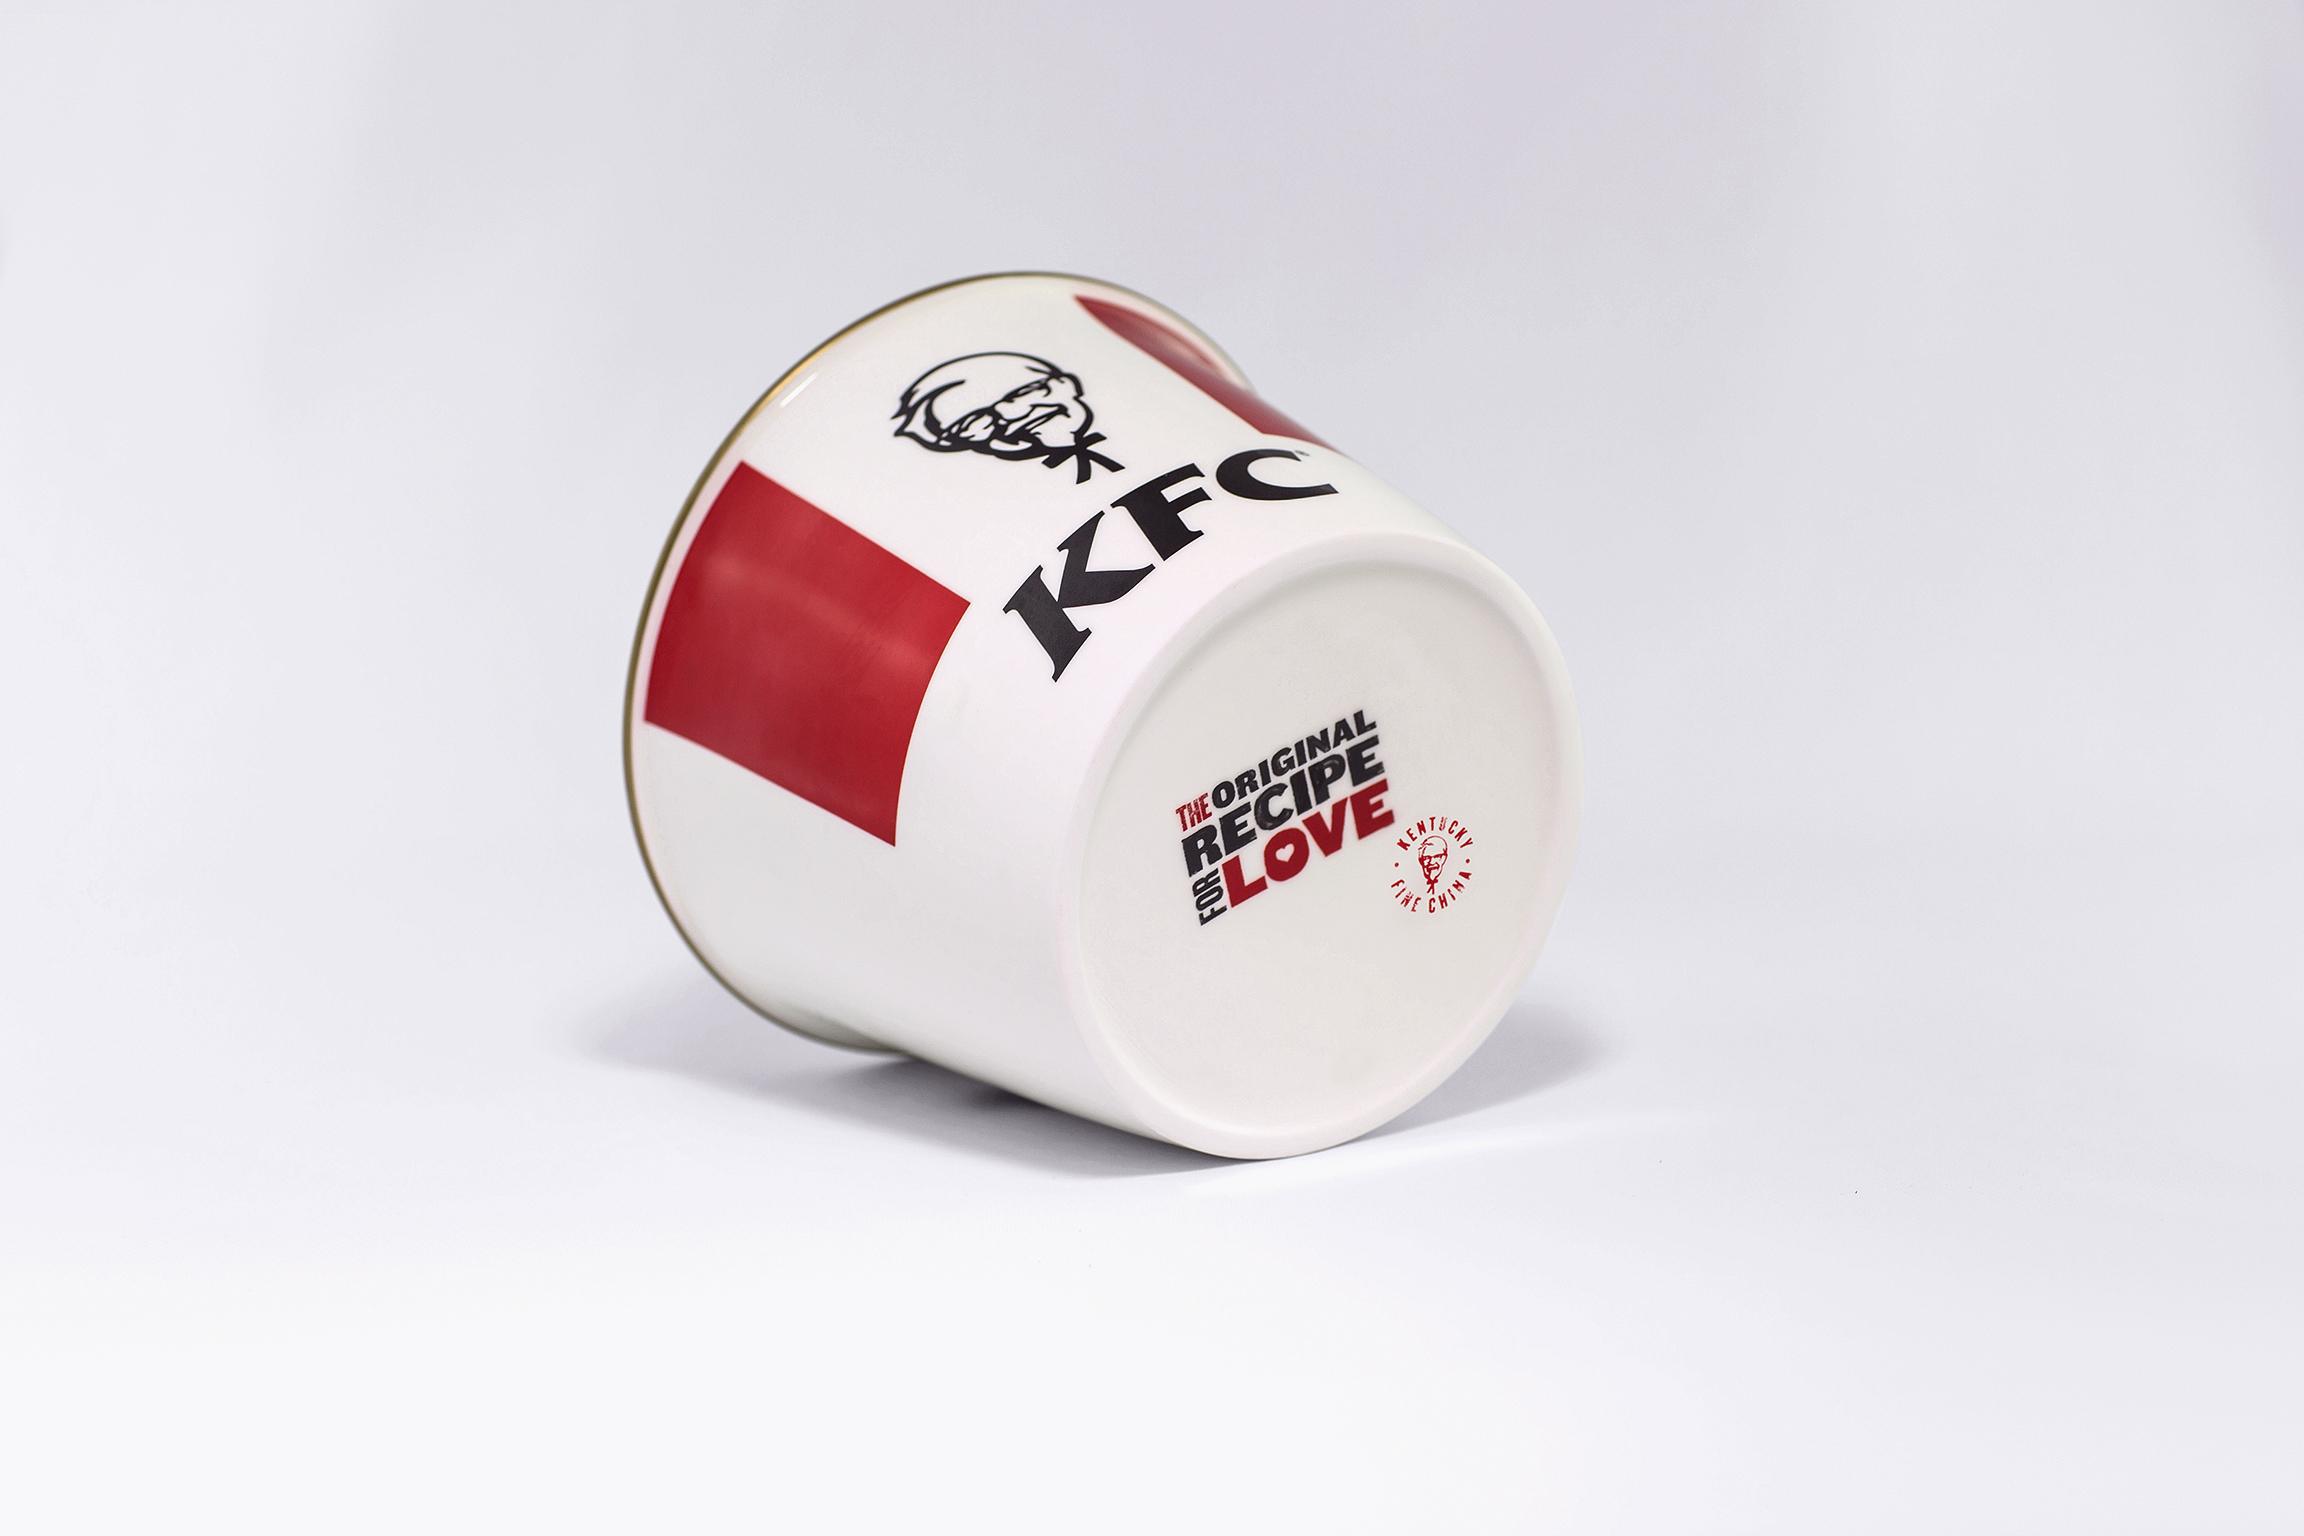 Thumbnail for KFC - Kentucky Fine China